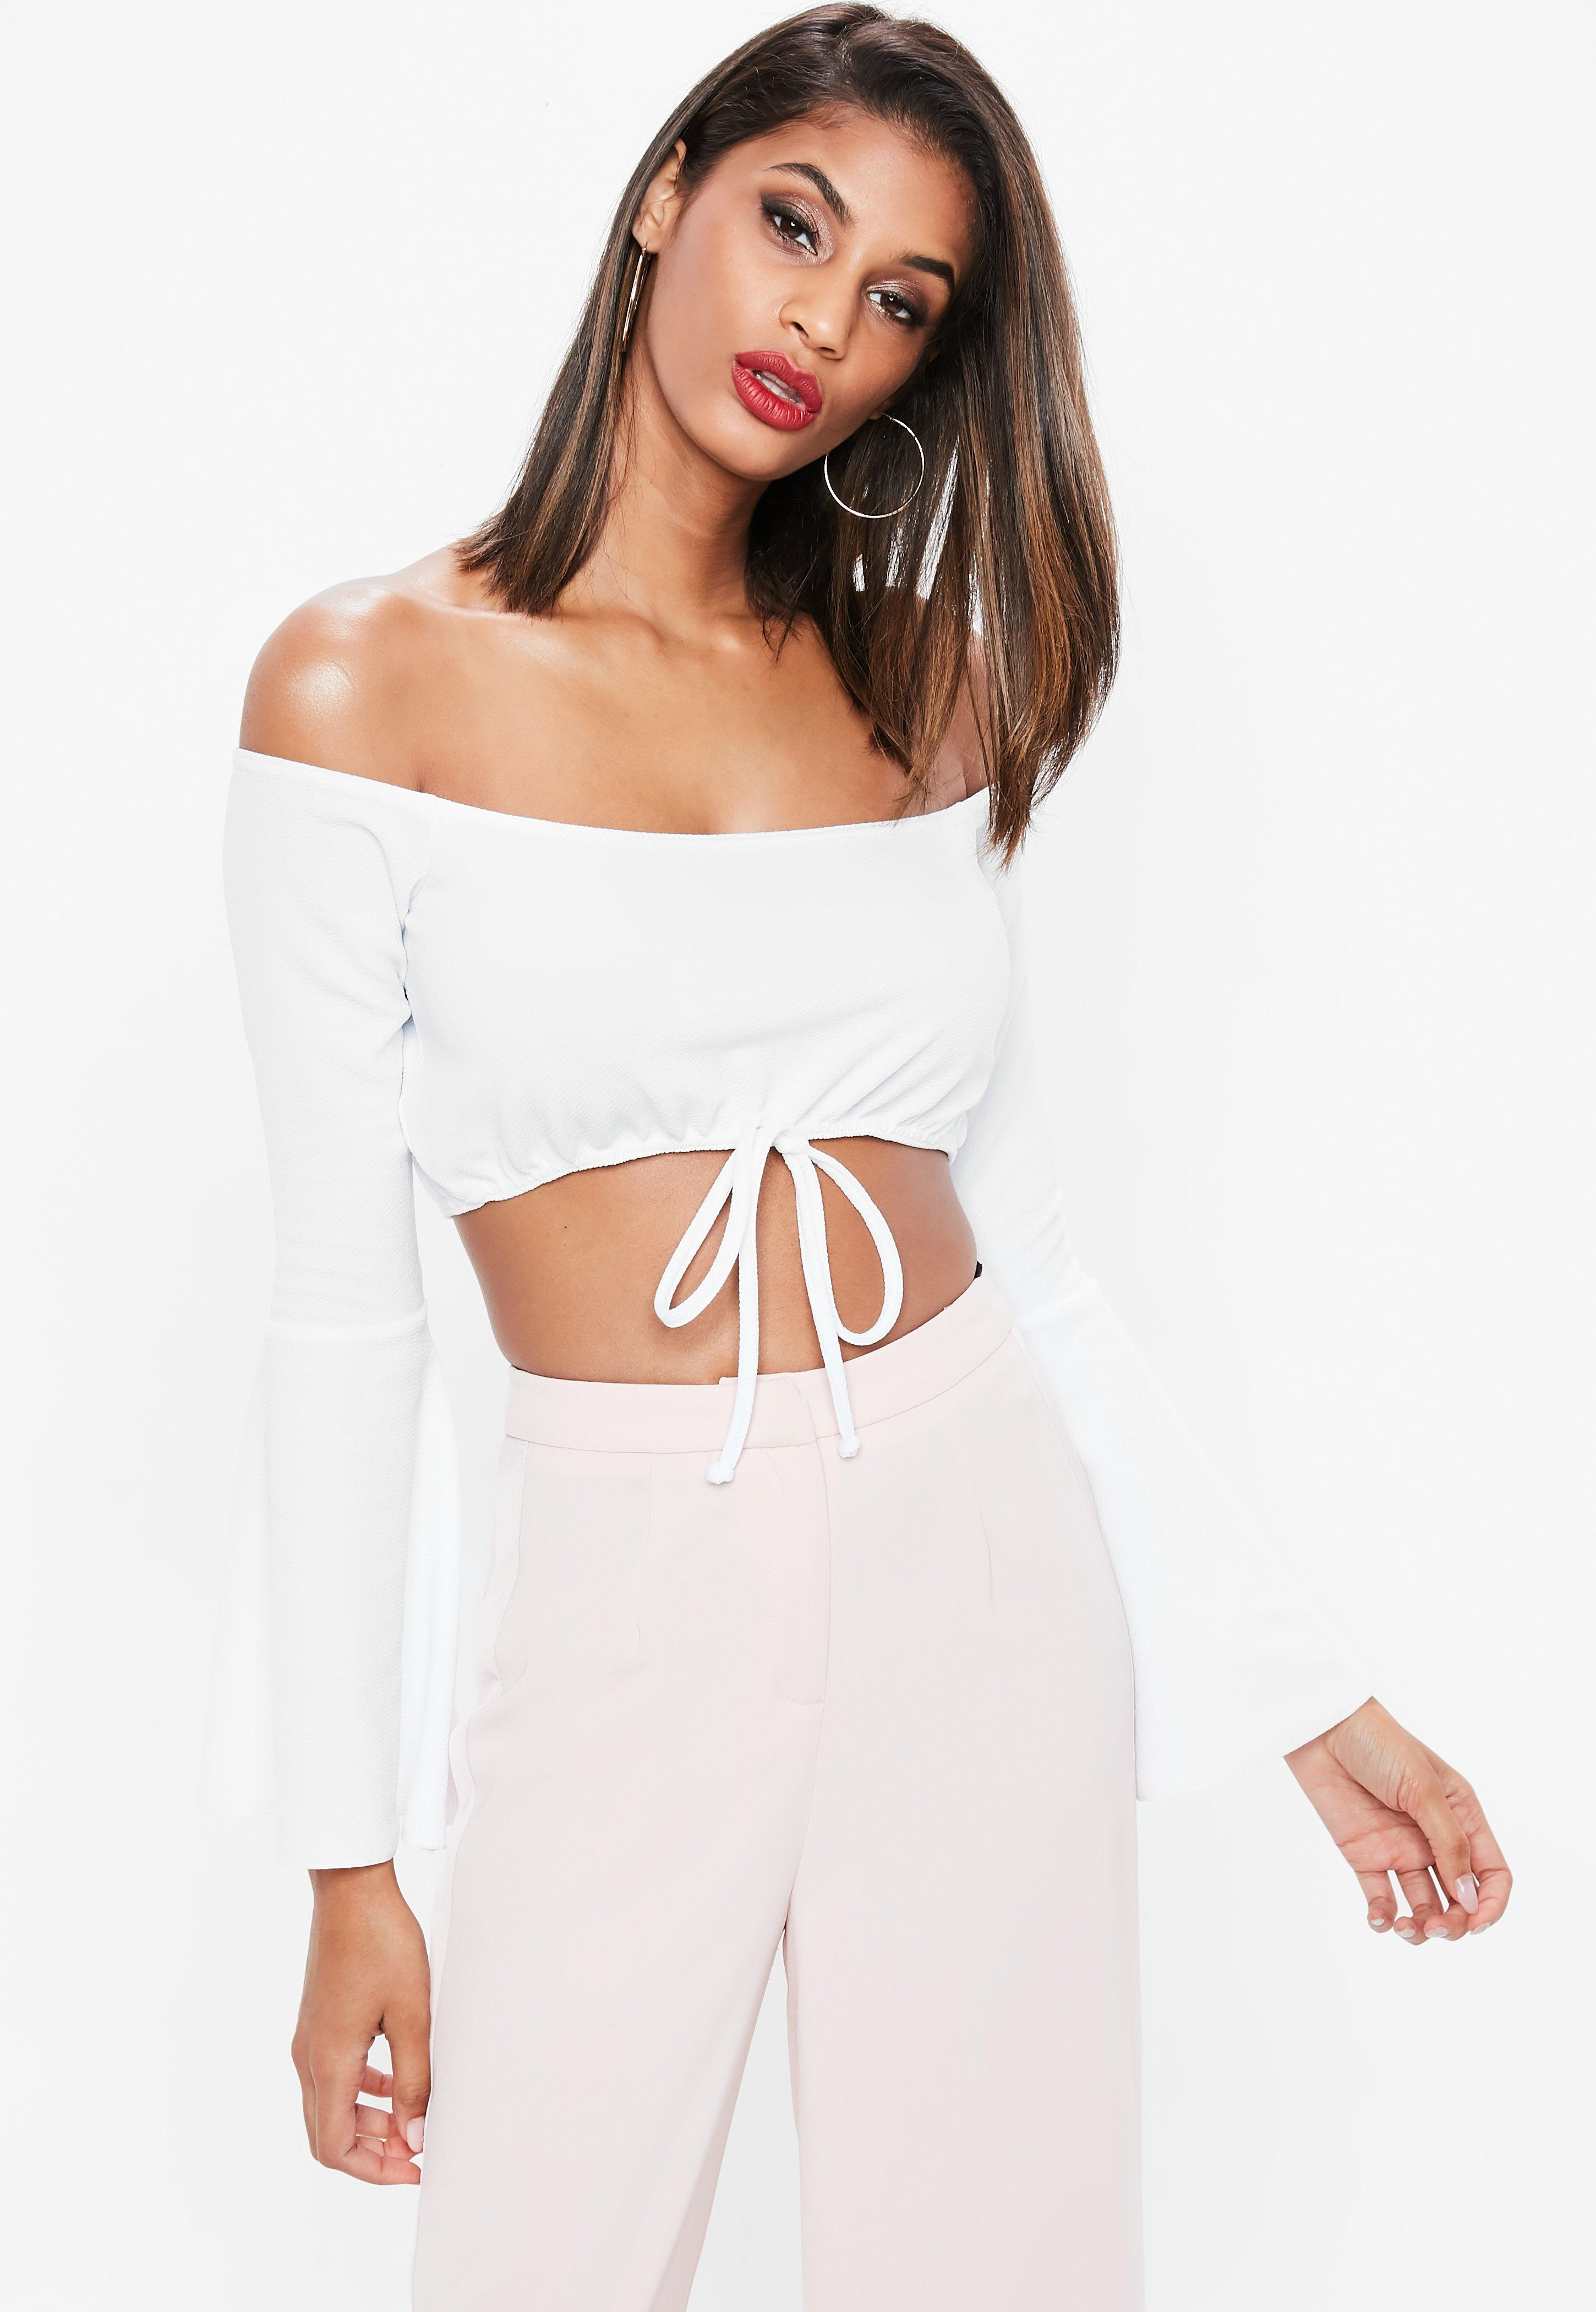 fdac1c2349a778 Lyst - Missguided White Tie Waist Flared Sleeve Bardot Crop Top in White